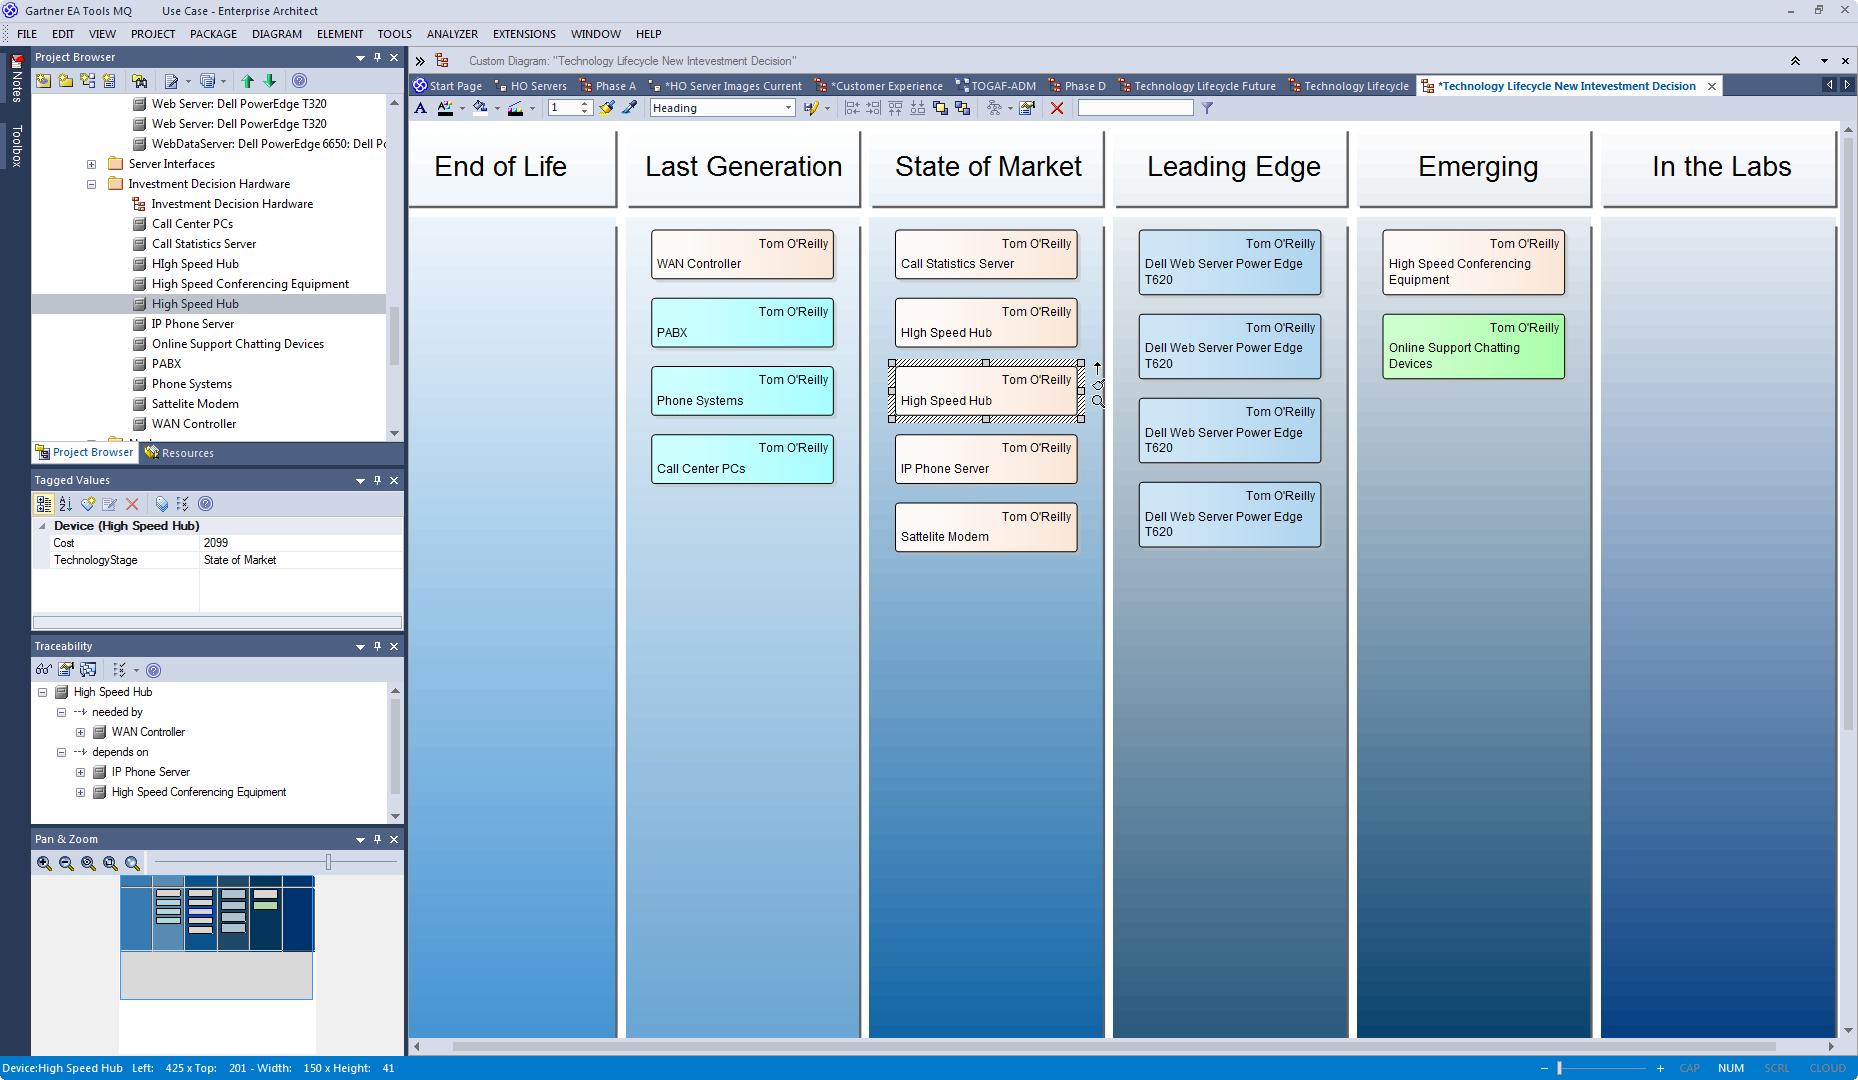 Enterprise architect the enterprise architecture solution sparx it portfolio management malvernweather Image collections